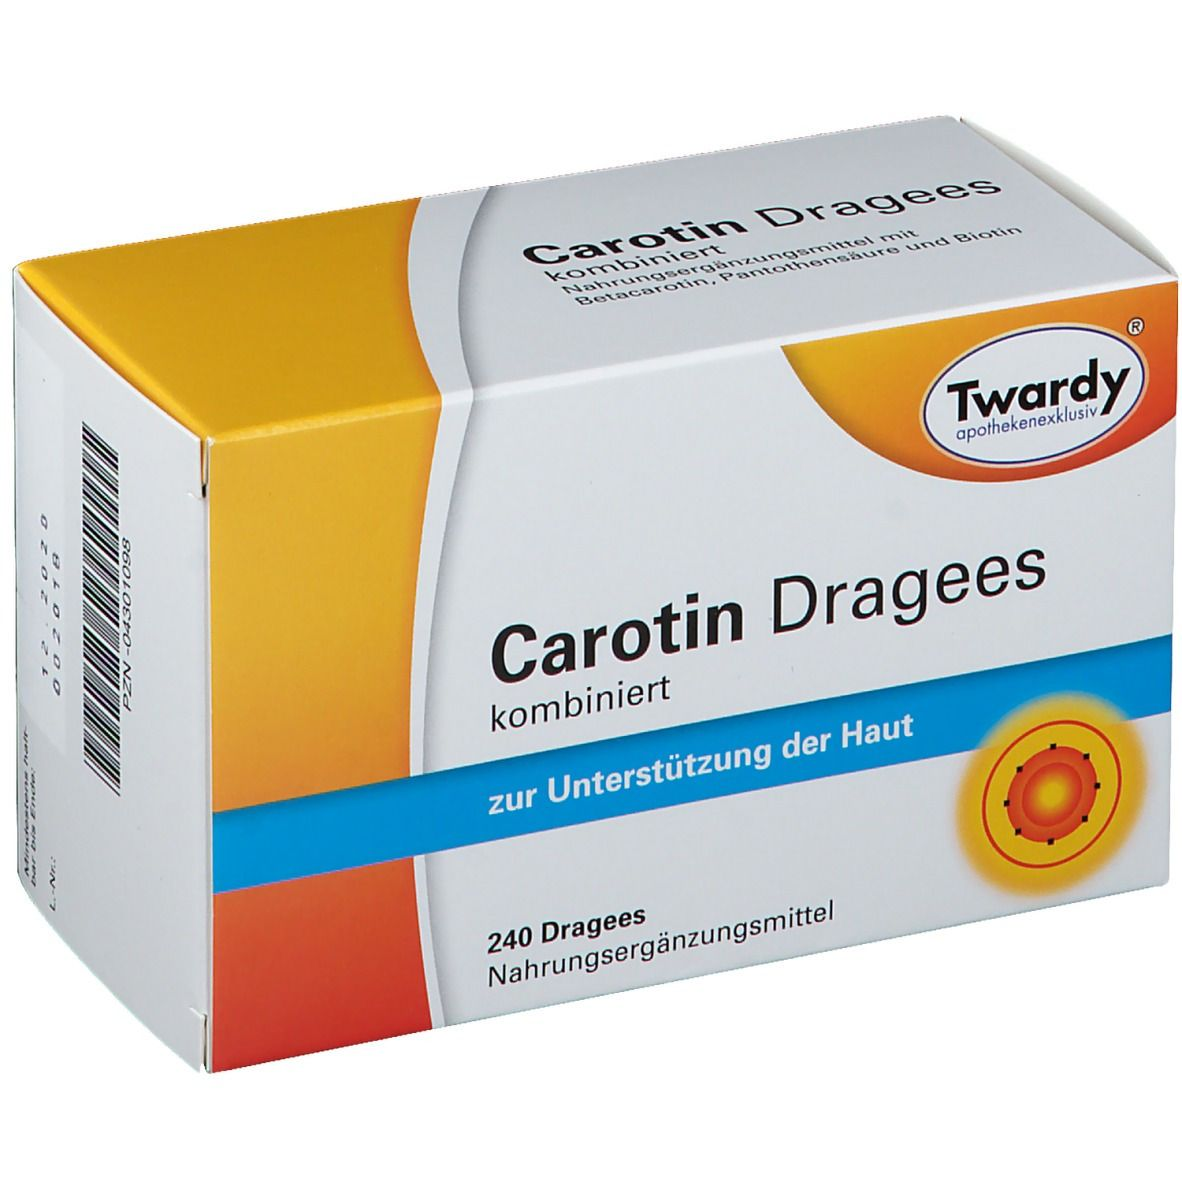 Image of Twardy® Carotin Dragees